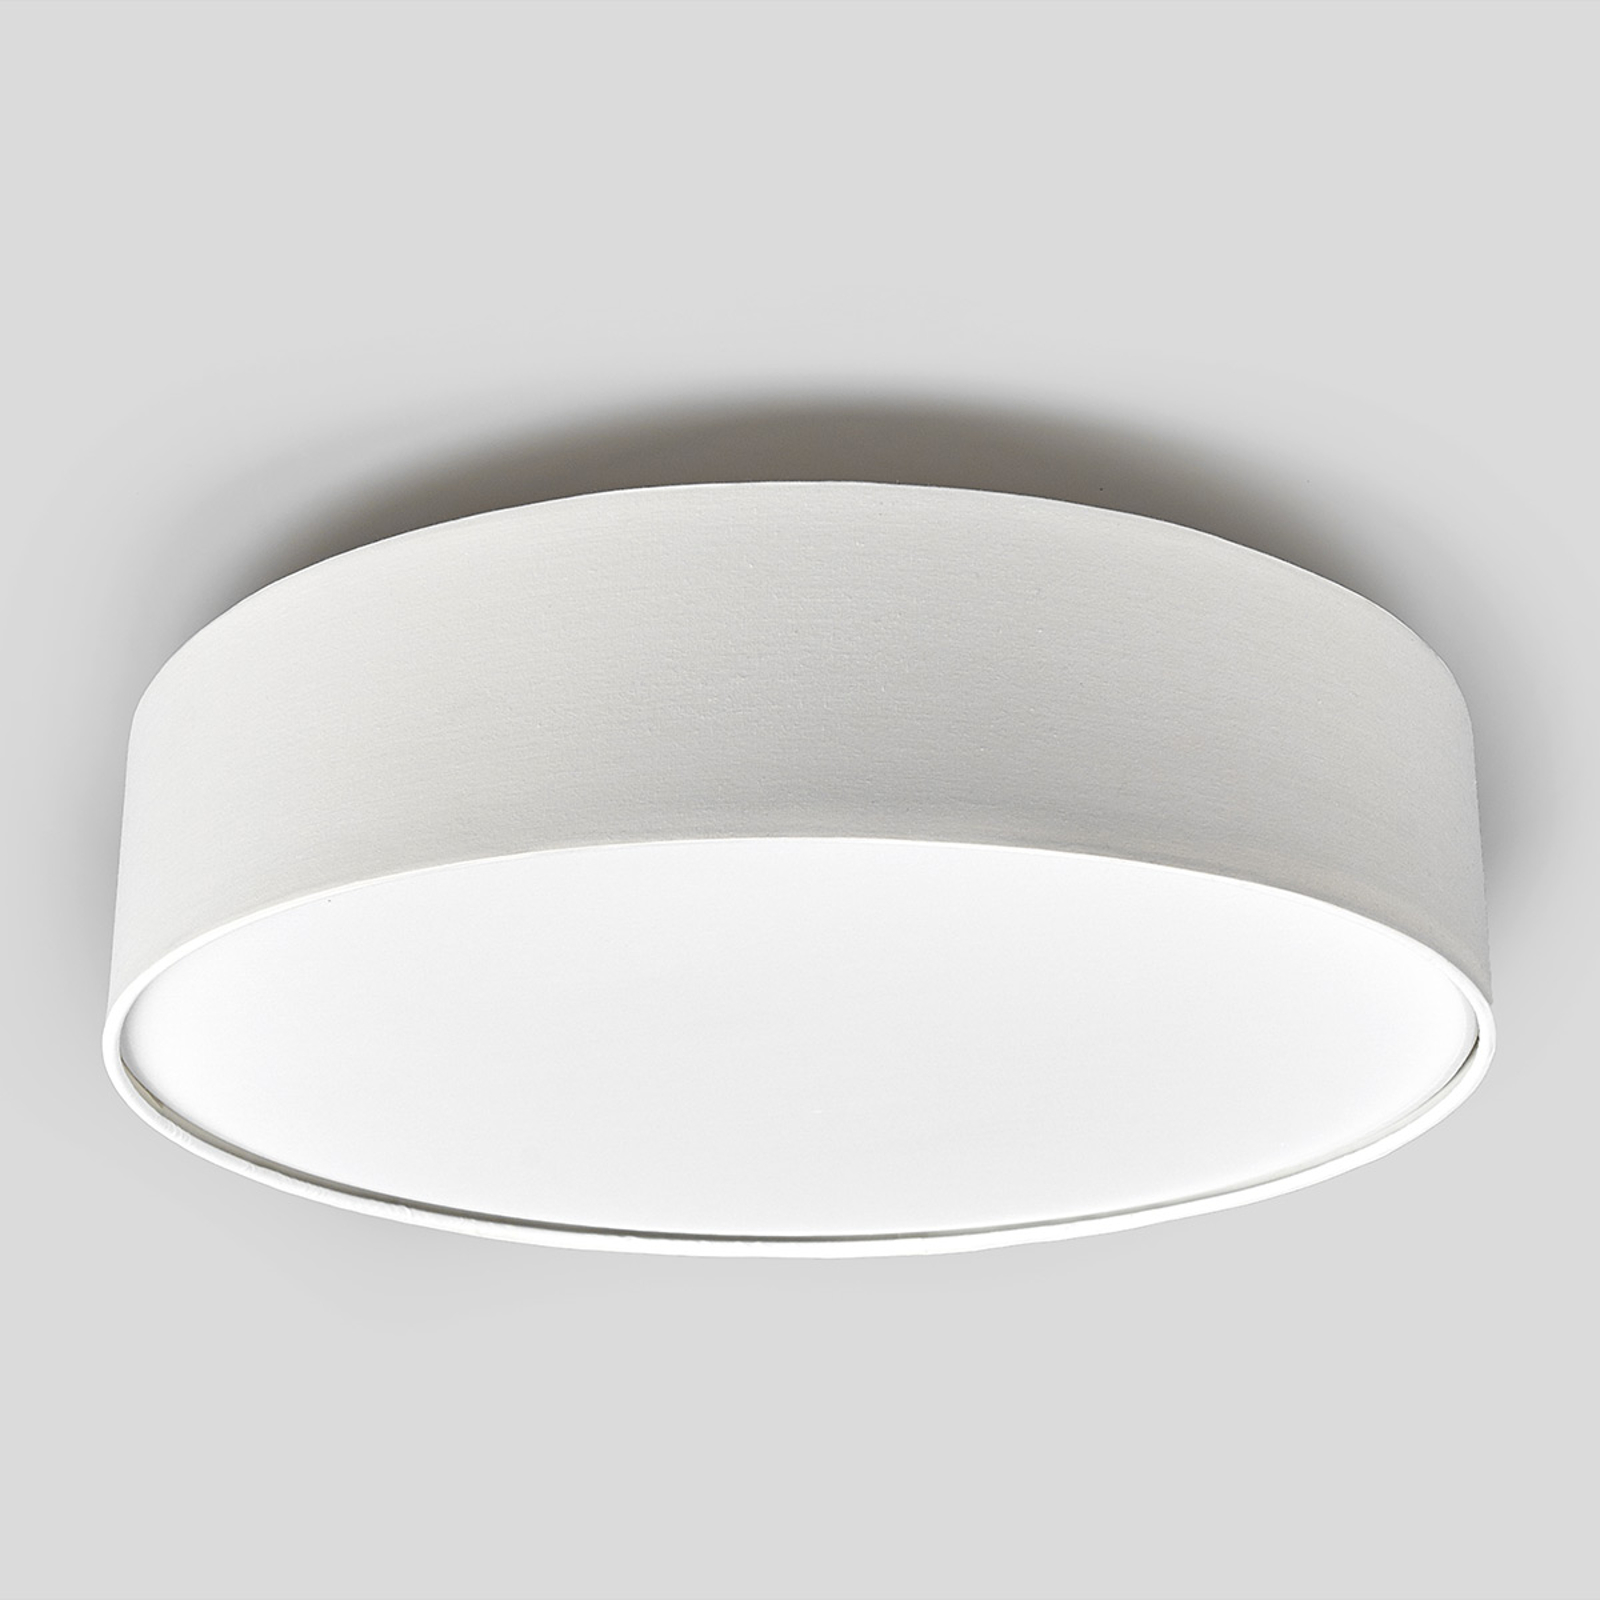 Sebatin - lampada LED da soffitto in tessuto crema